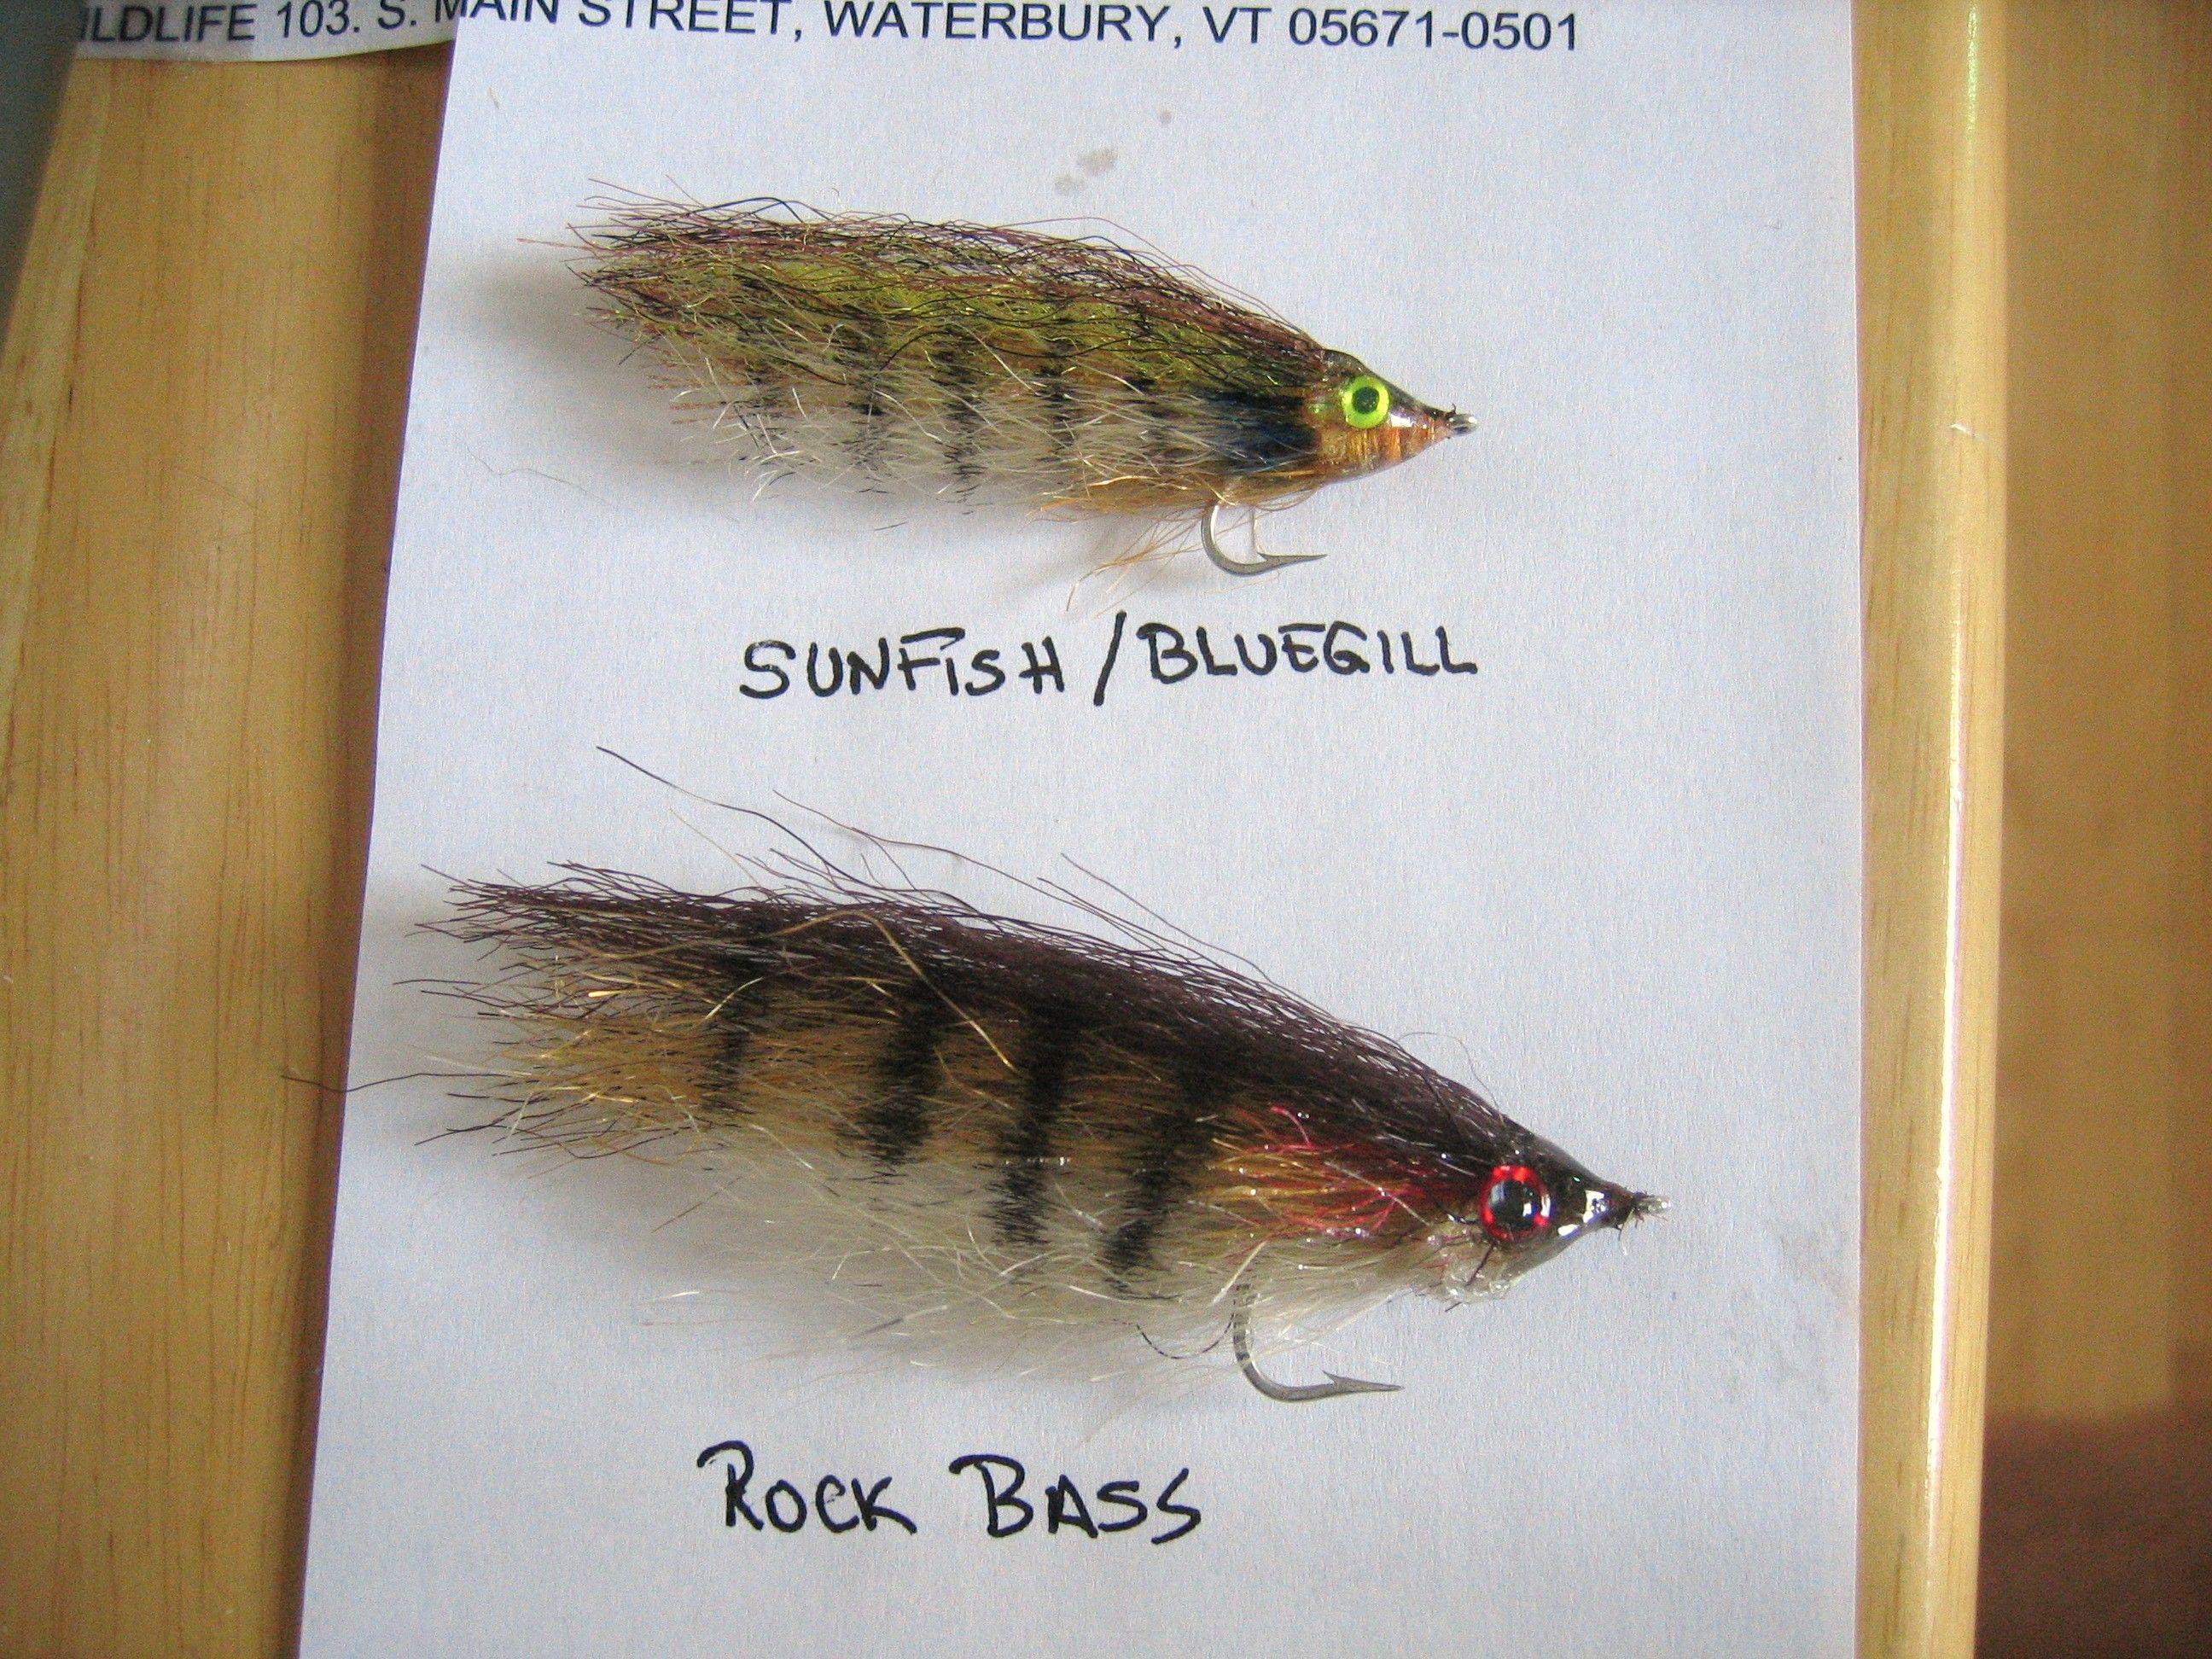 bluegill & rockbass patterns - fly fishing forum | fly fishing, Fly Fishing Bait